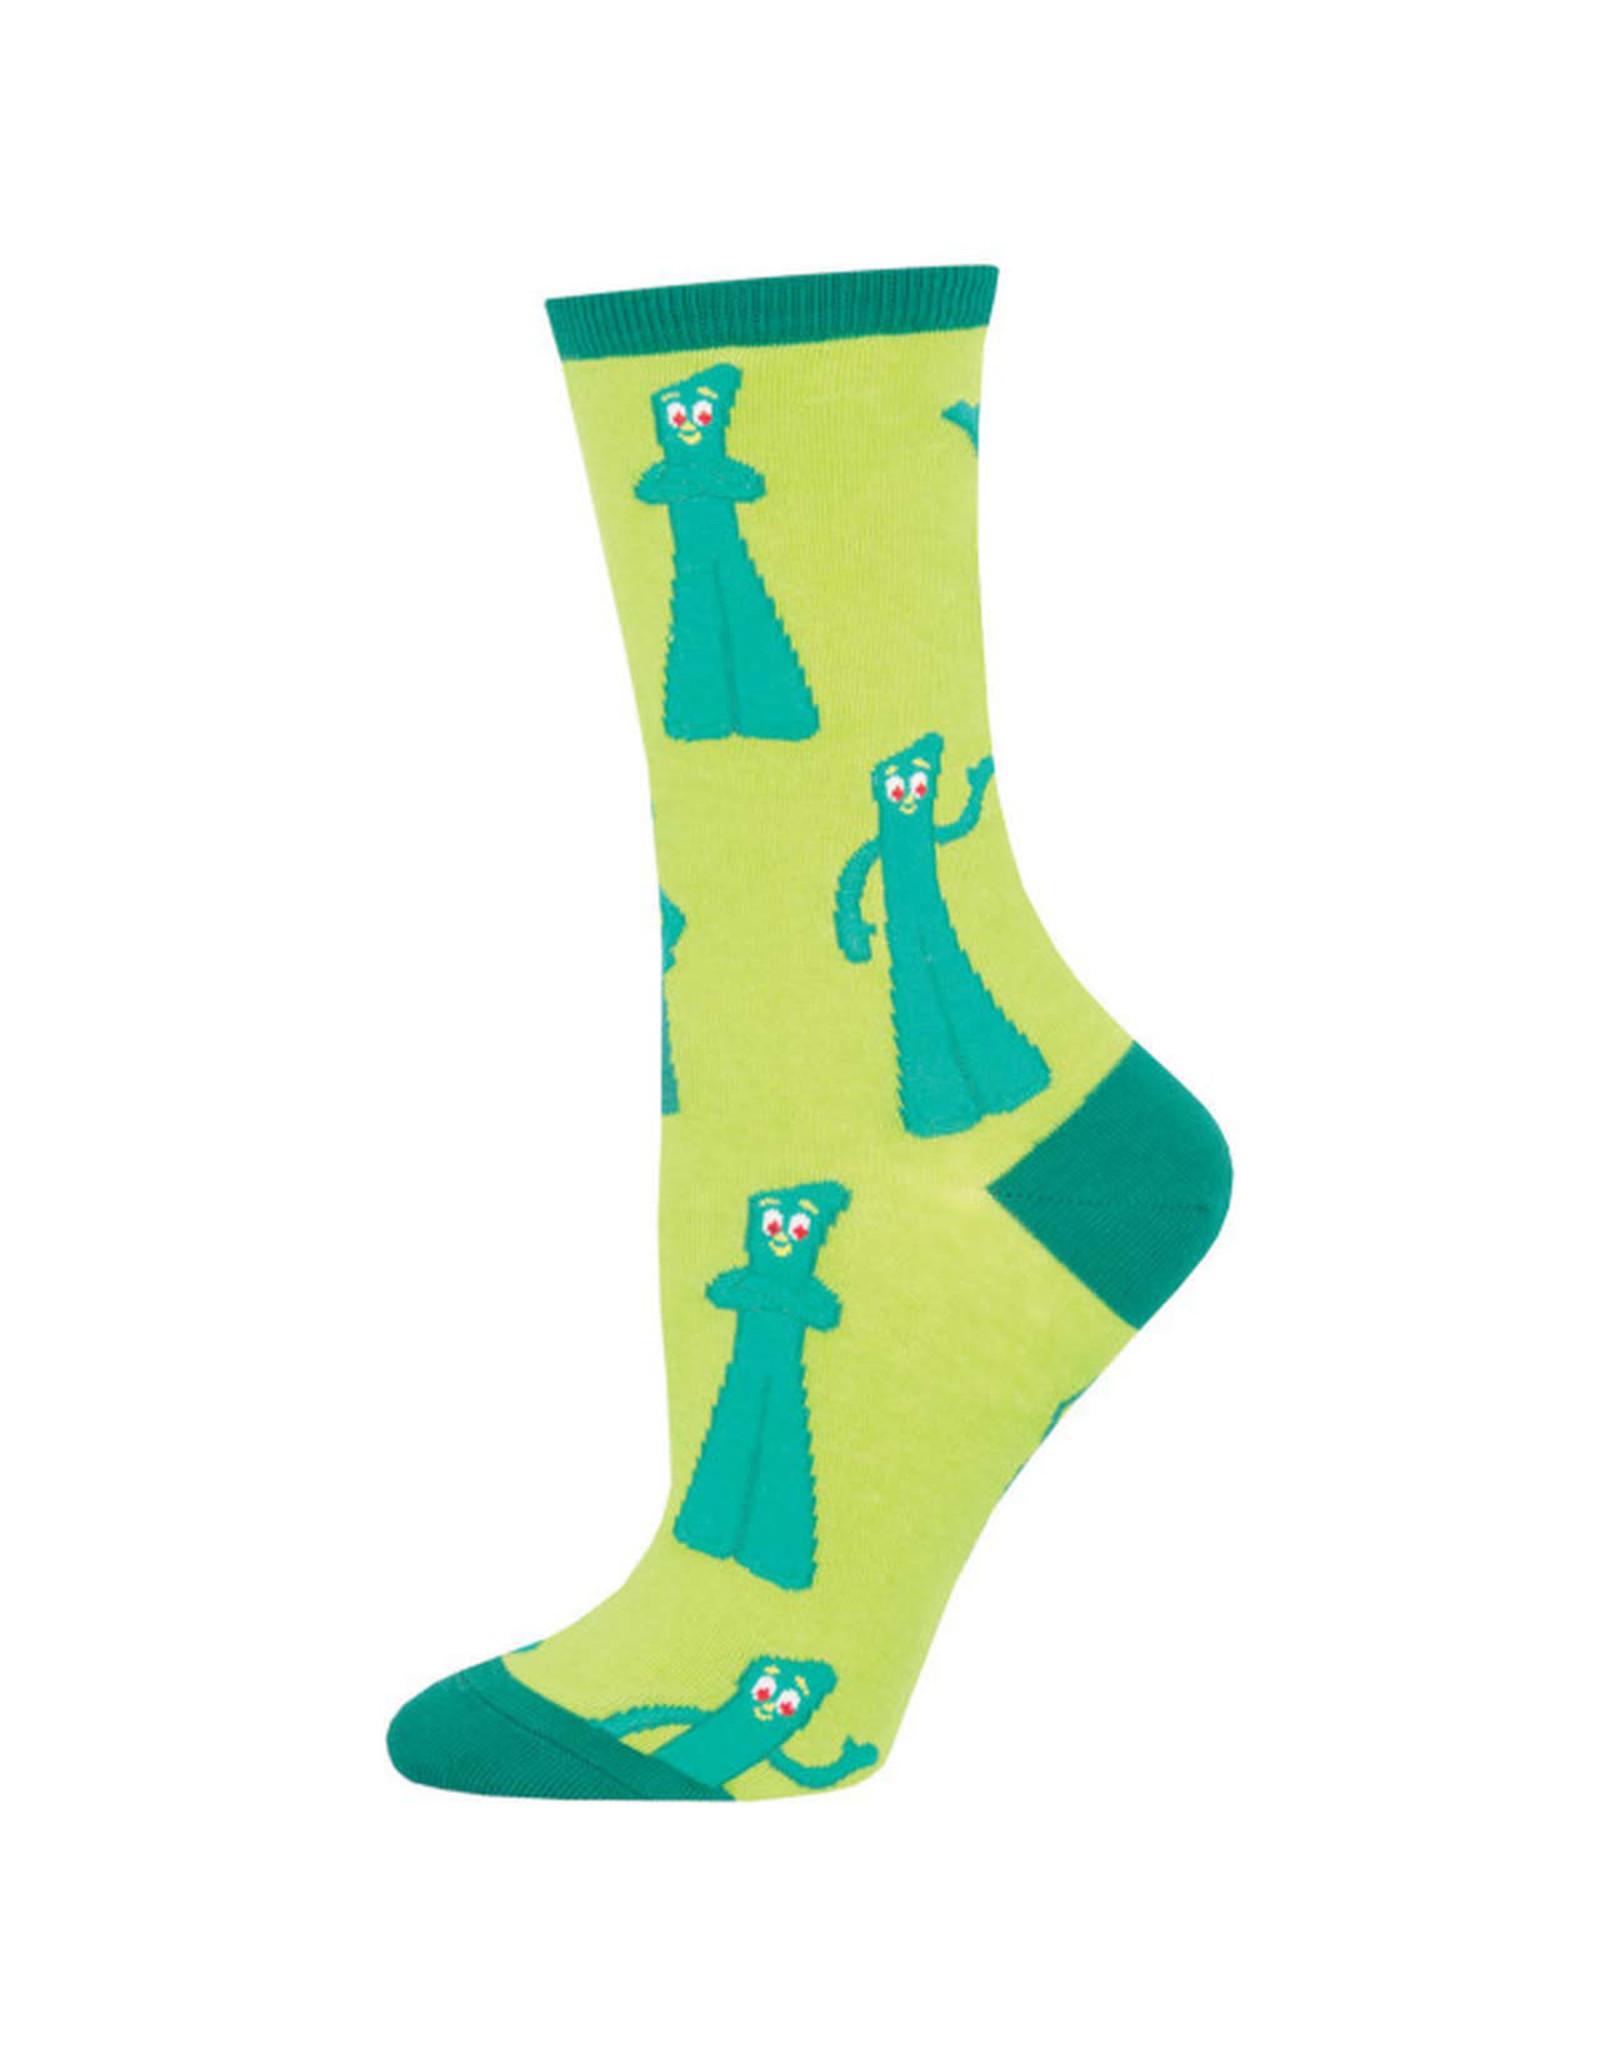 Socks (Womens) - Gumby